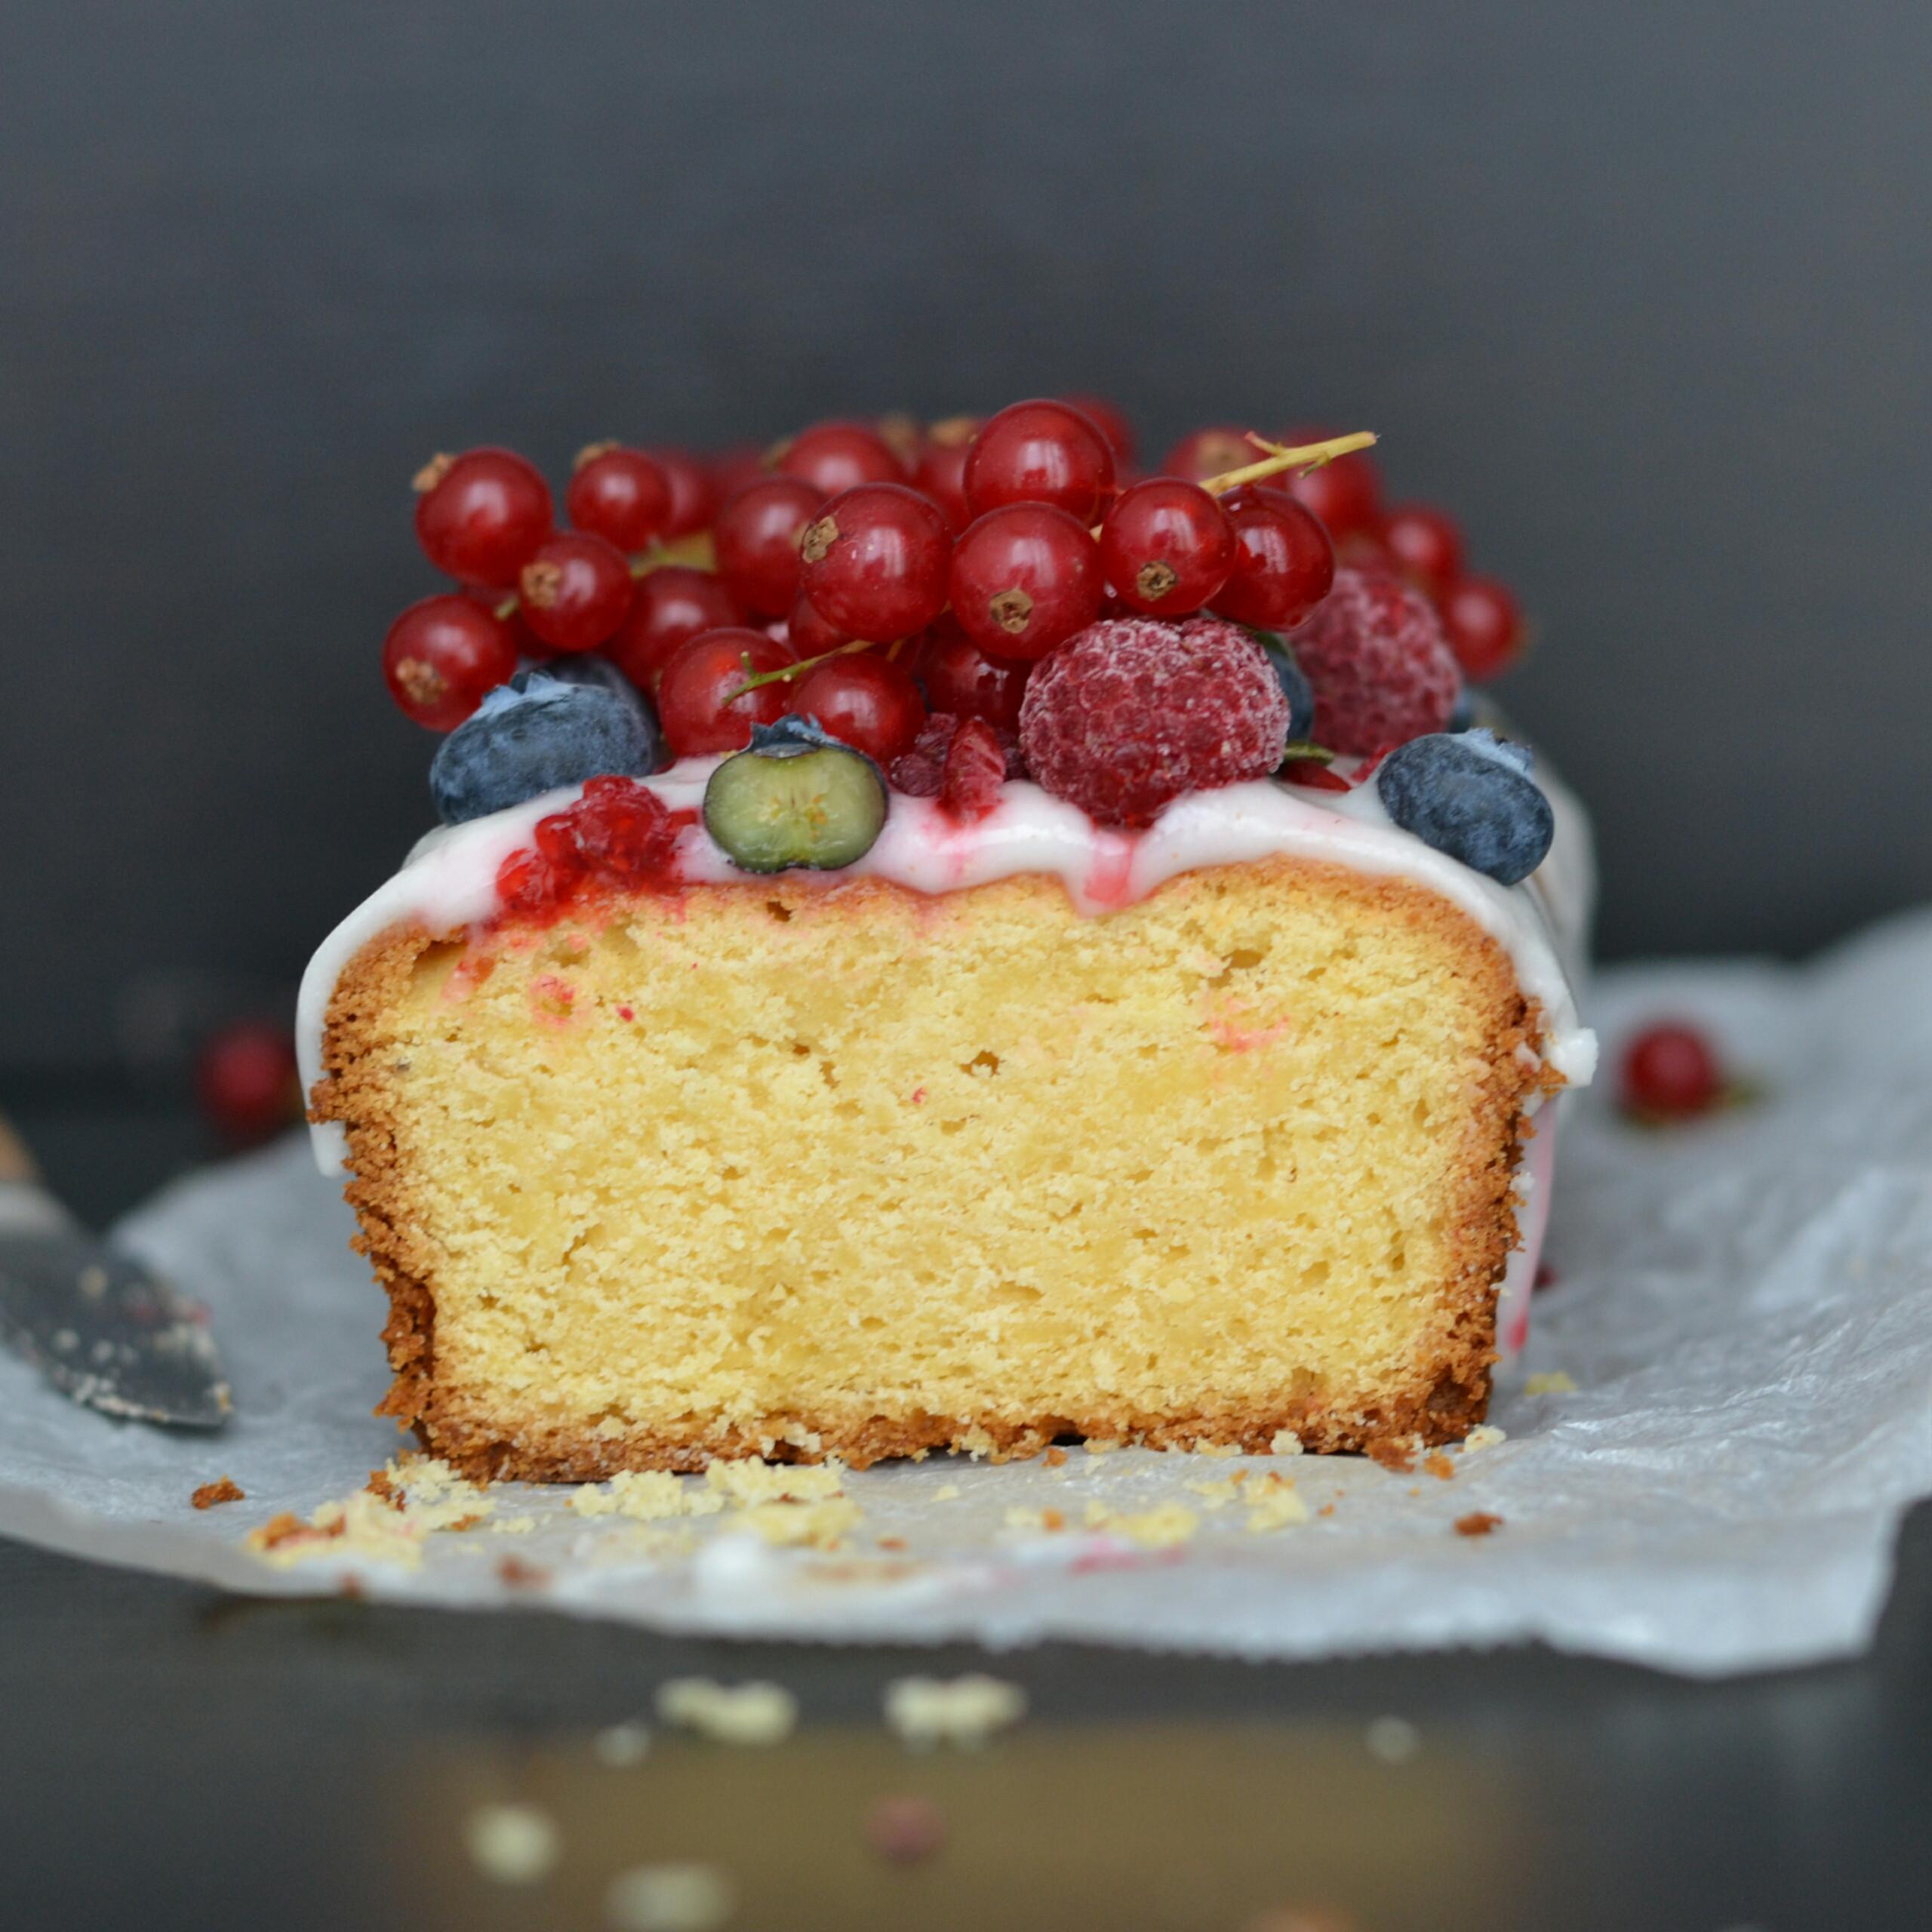 Vegan Lemon Cake Recipes  Gluten free vegan cake Anne Travel Foo